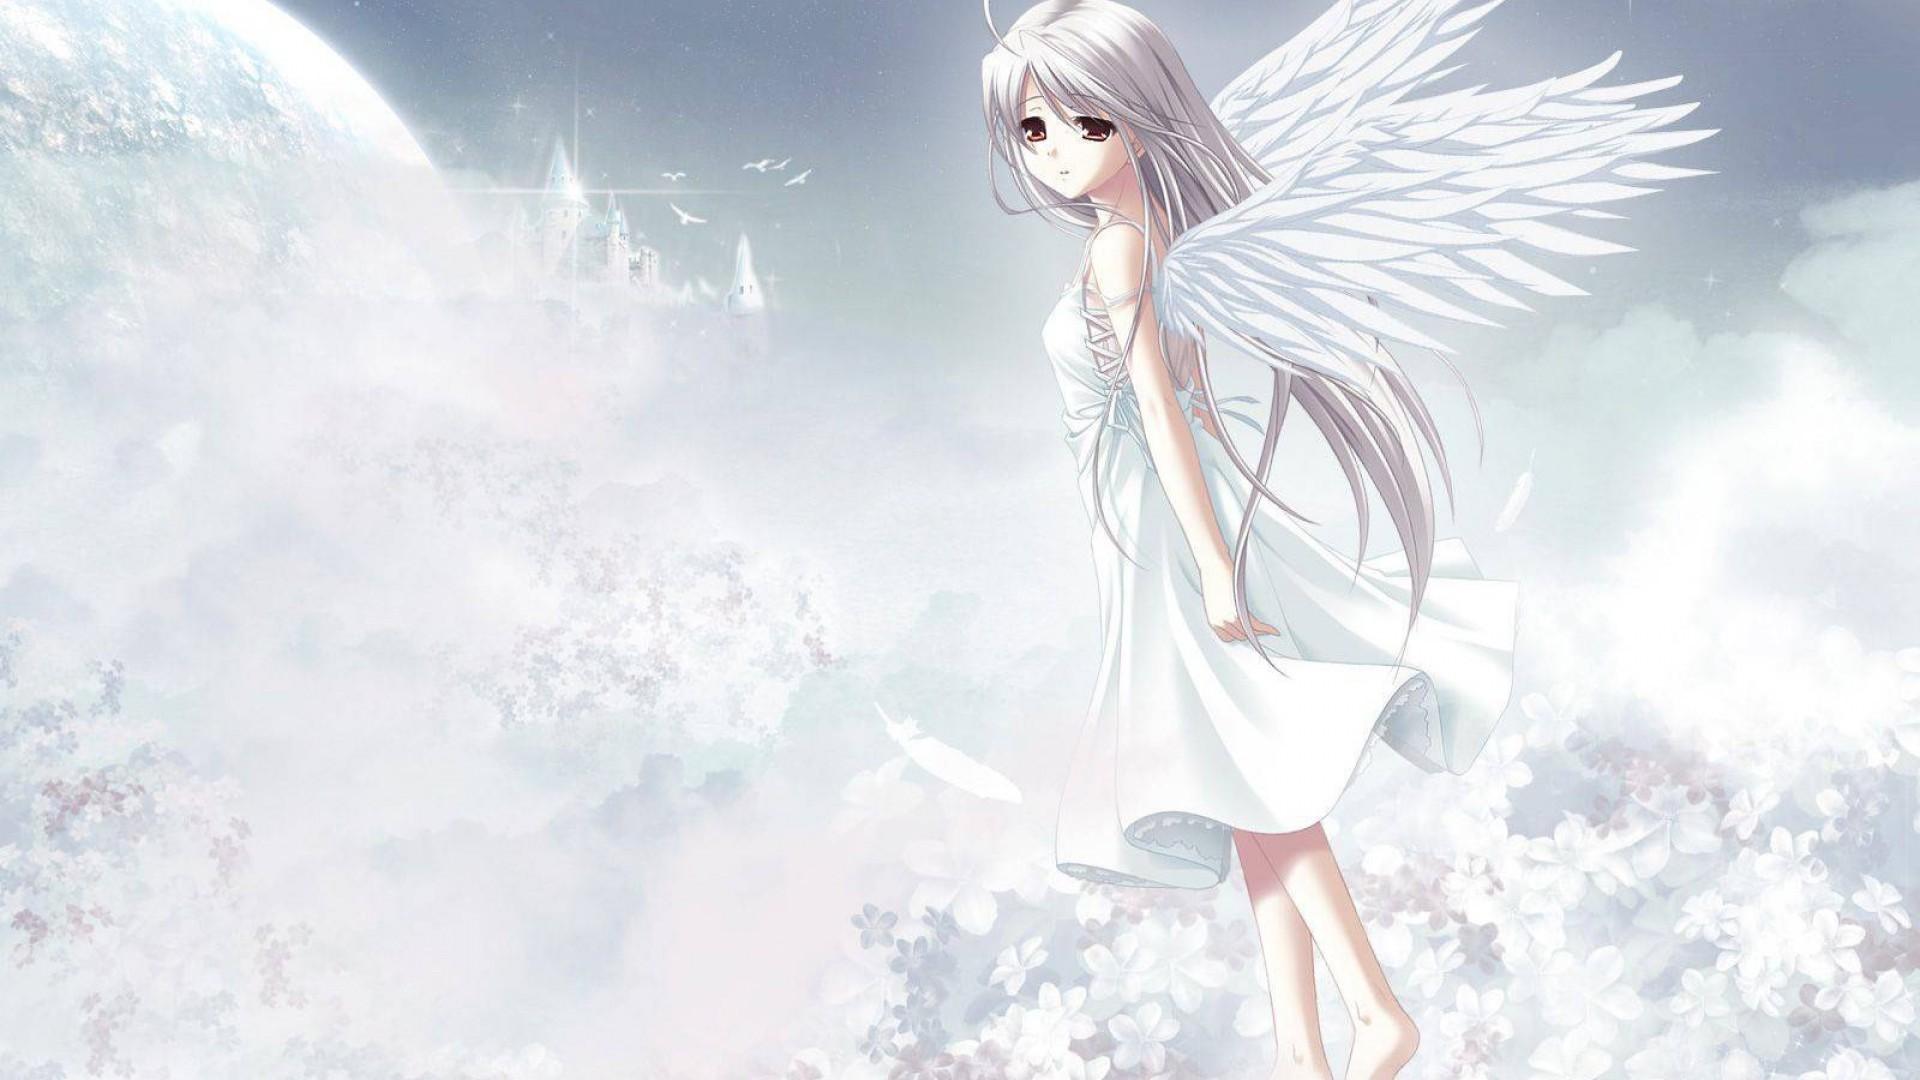 Tachibana kanade · anime · anime girls · women. Anime Angels Wallpaper ·① WallpaperTag